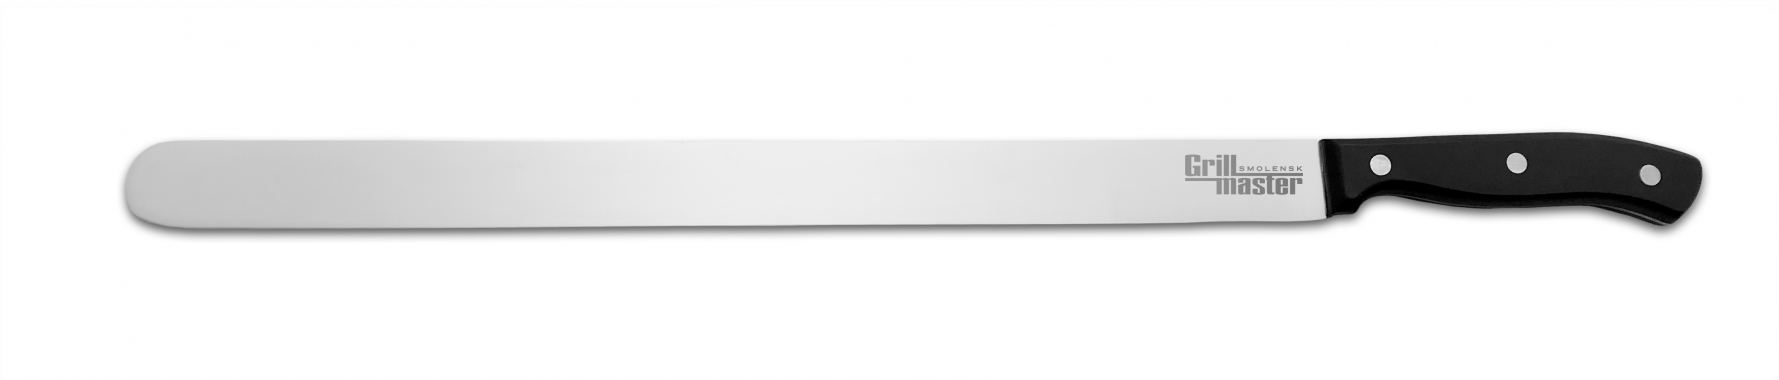 Нож для шавермы Grill Master